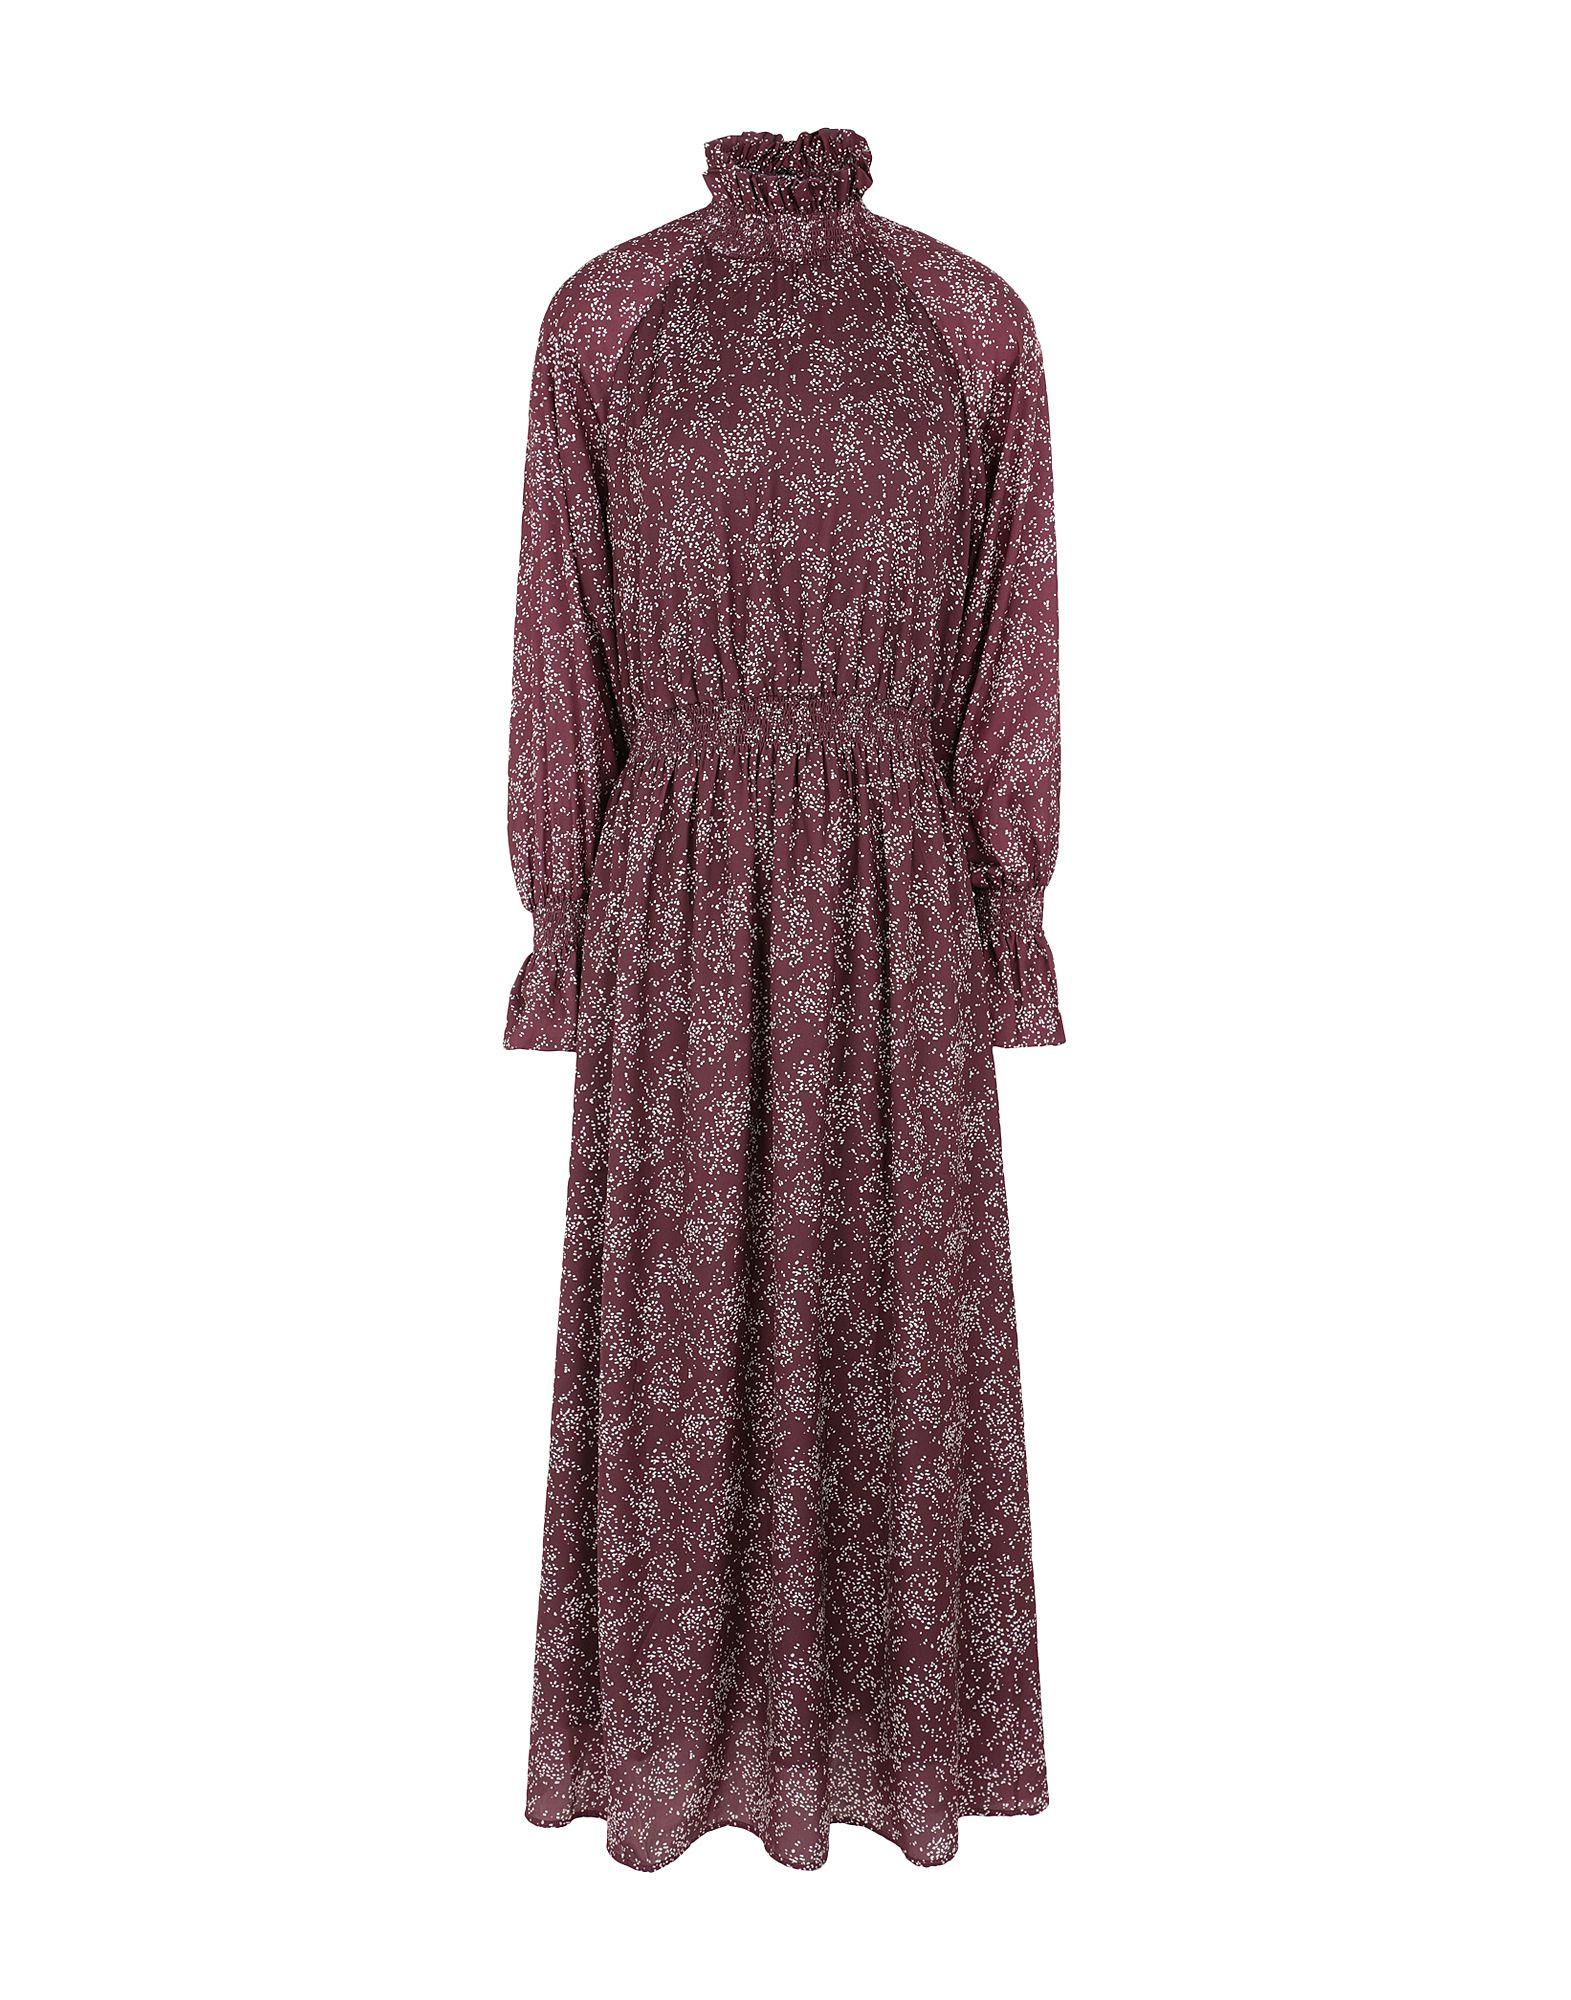 8 by YOOX Длинное платье theory длинное платье